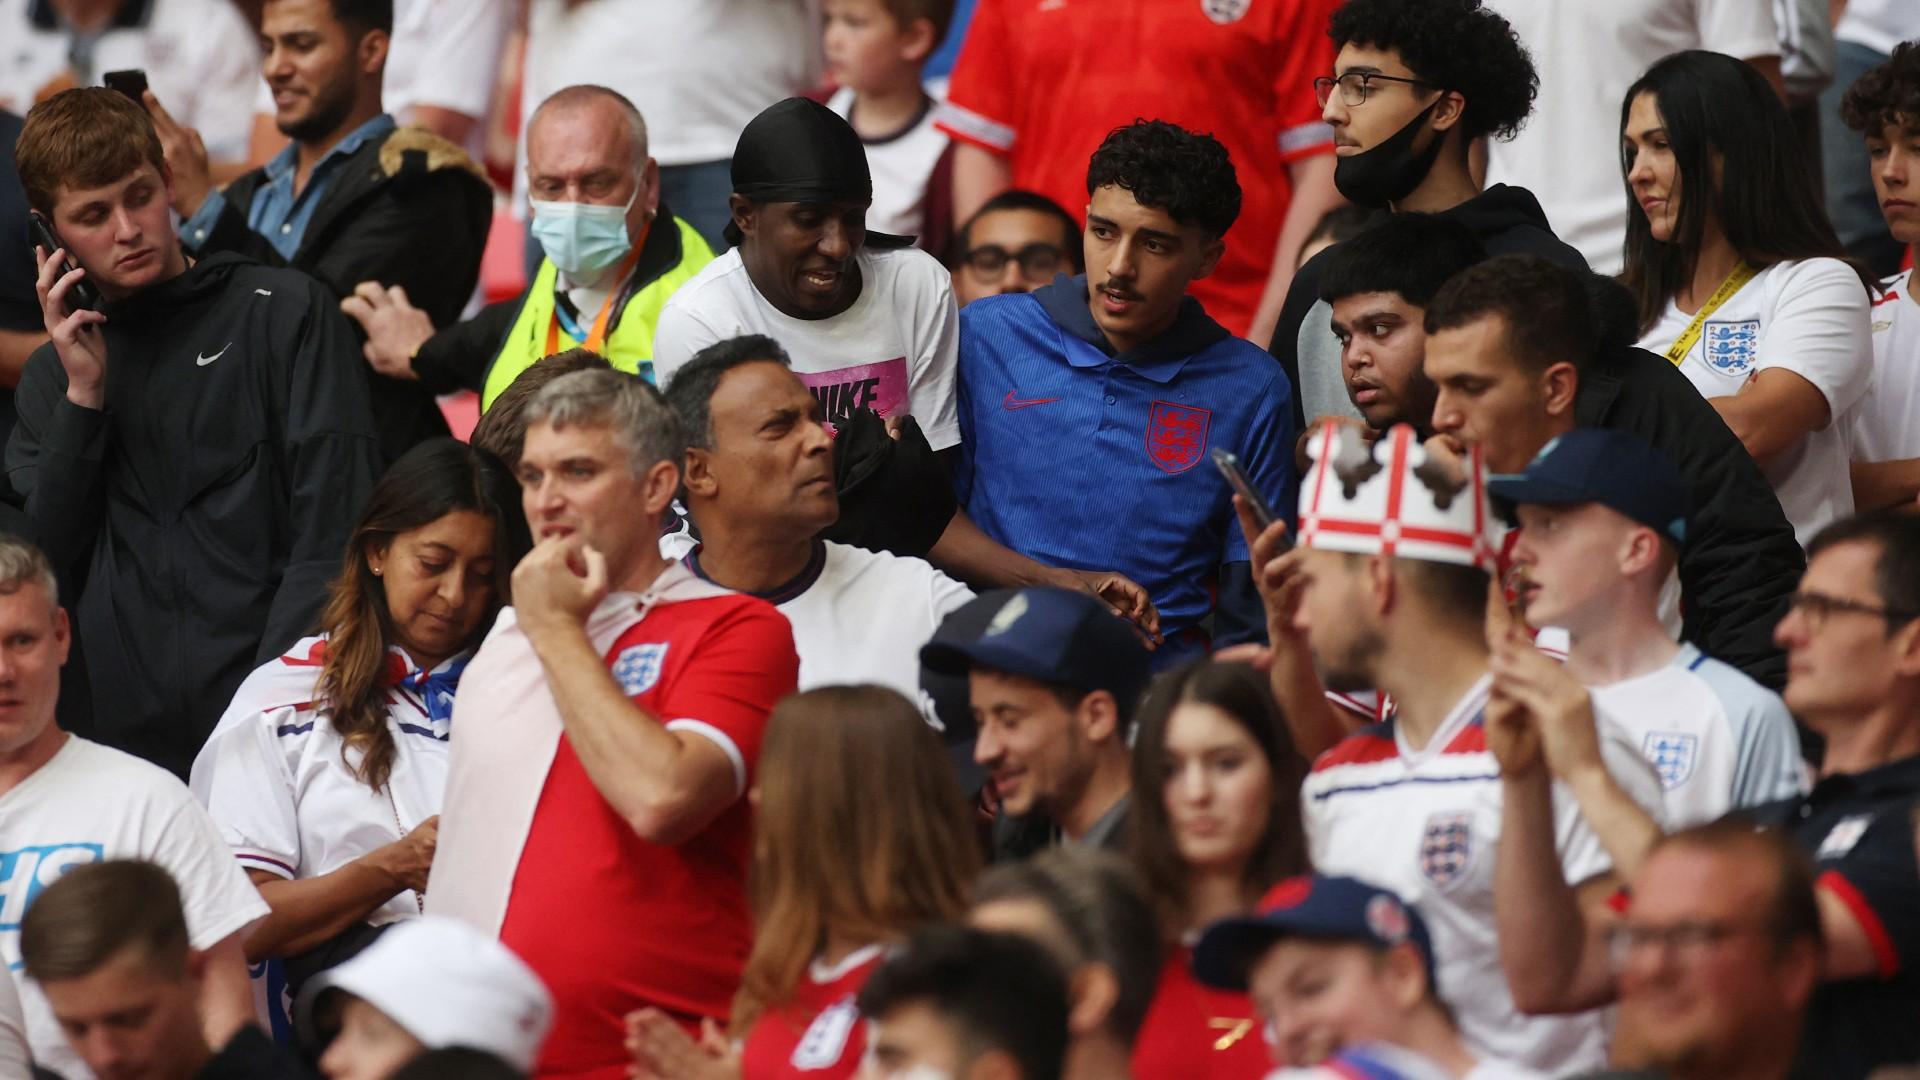 UEFA opens disciplinary proceedings against England over Euro 2020 final disturbances